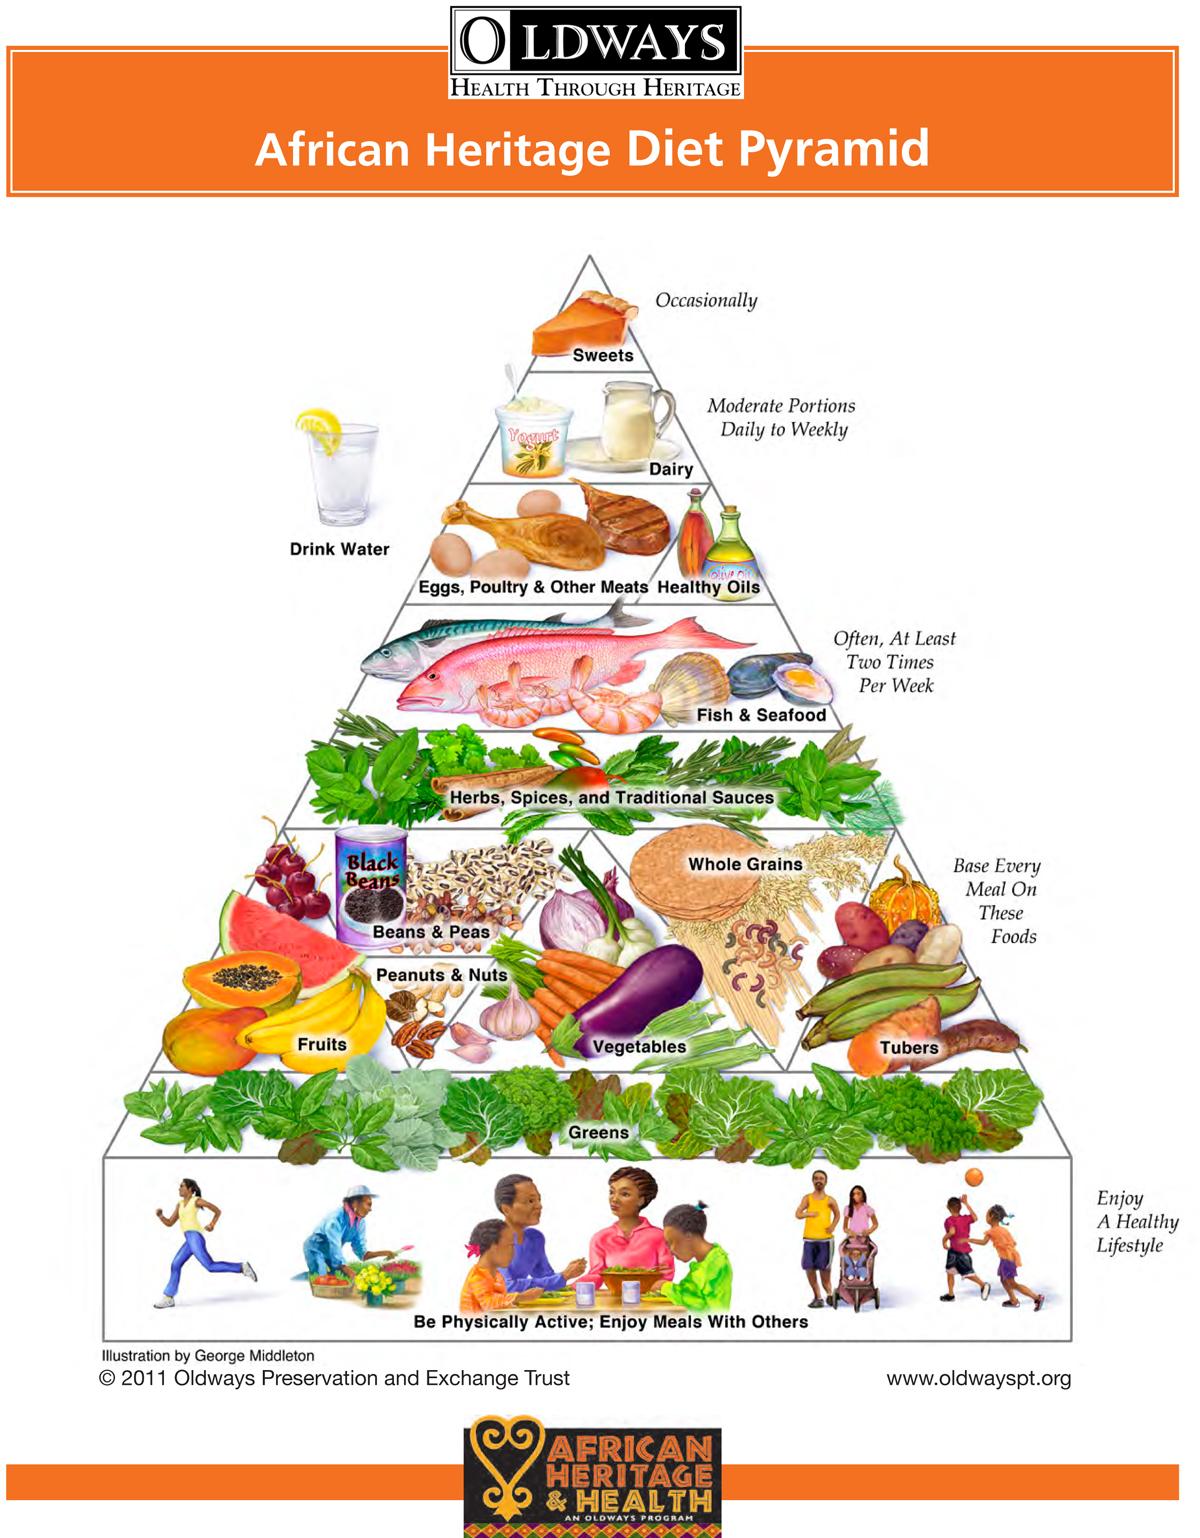 Oldways AHHPyramid.jpg